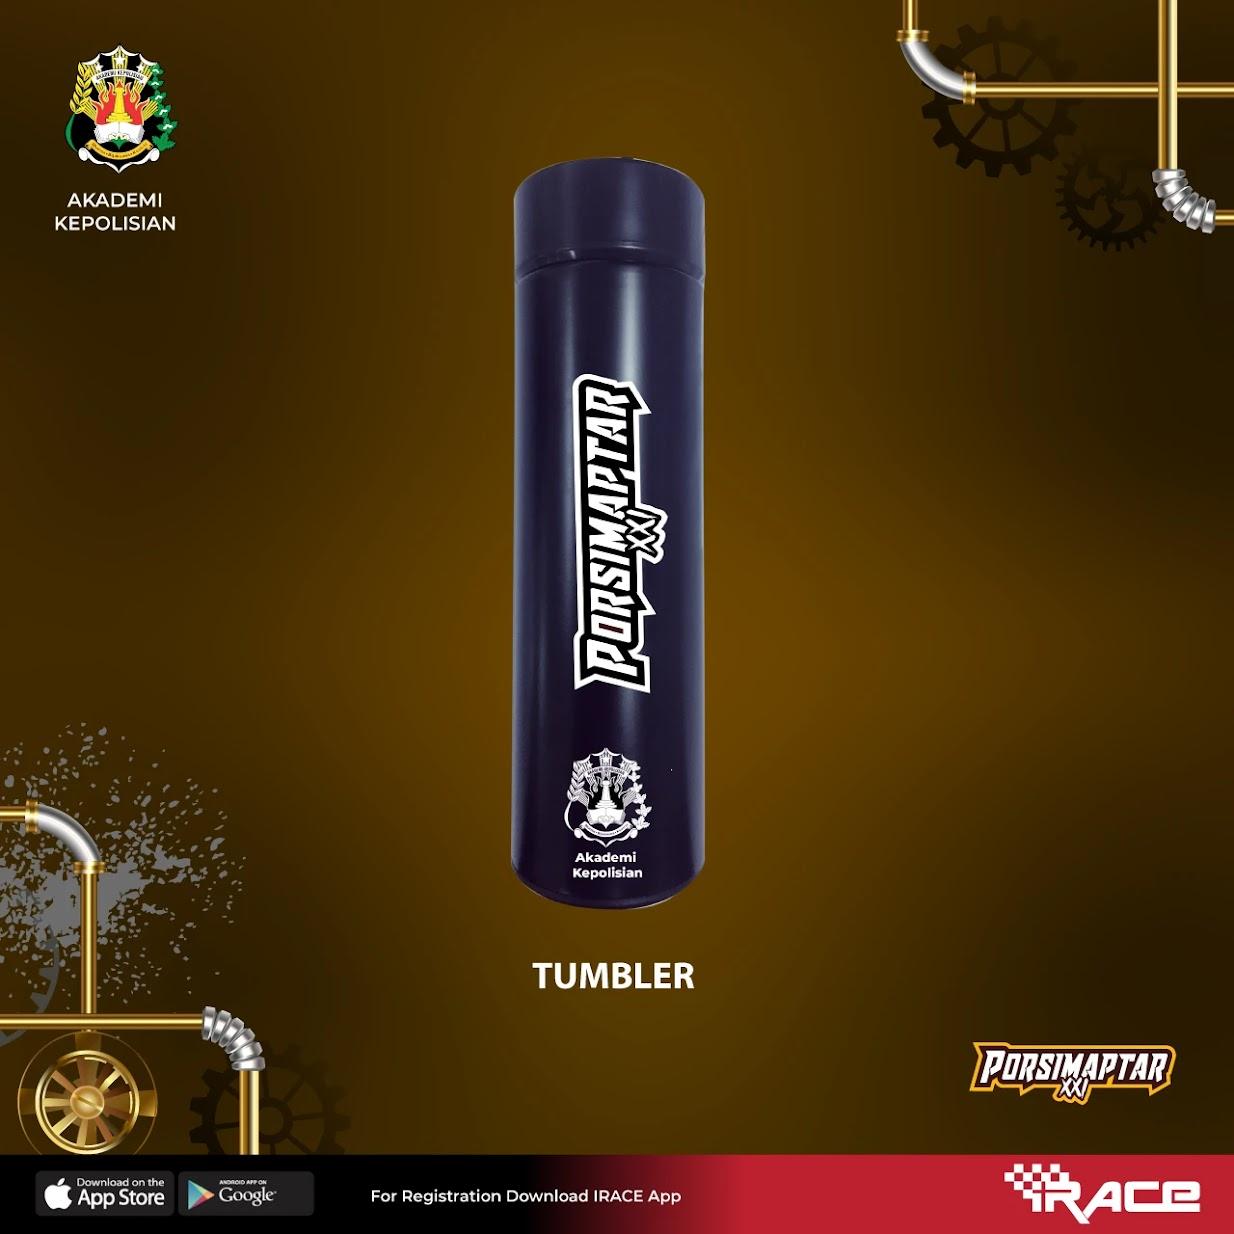 Tumbler 🥤 Porsimaptar Virtual Run XXI • 2021